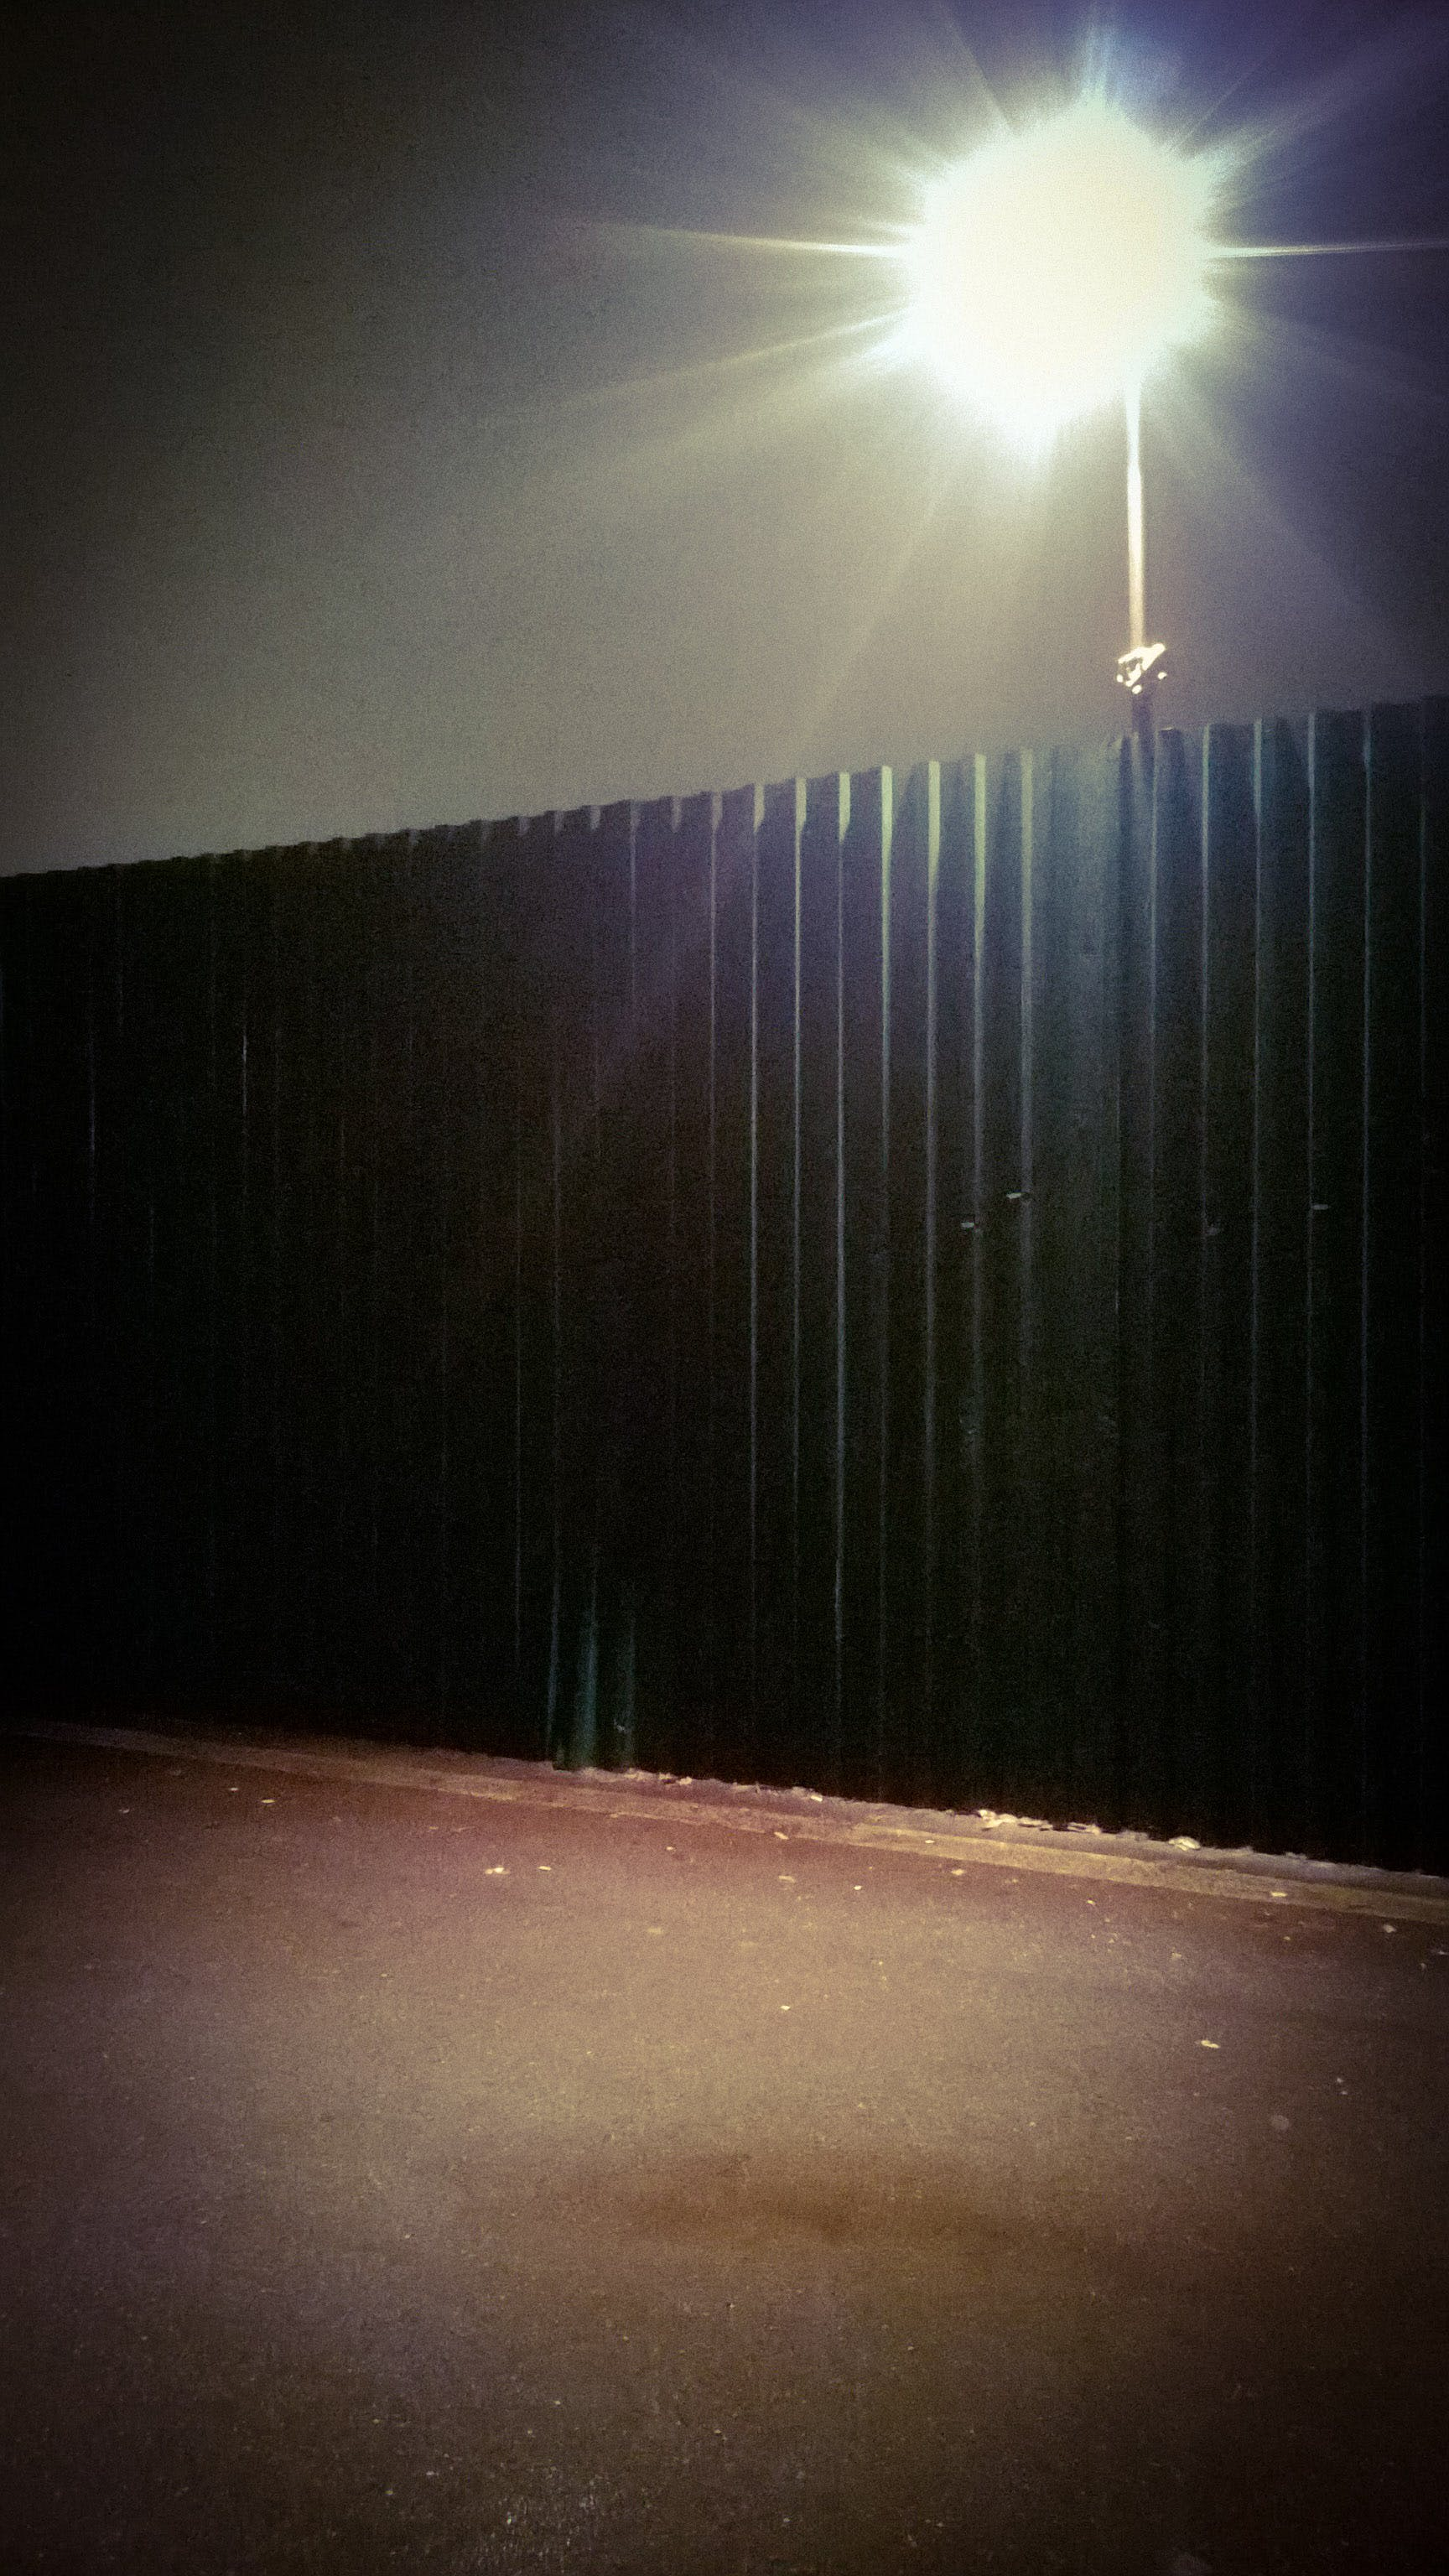 Black Fence Below Gray Light